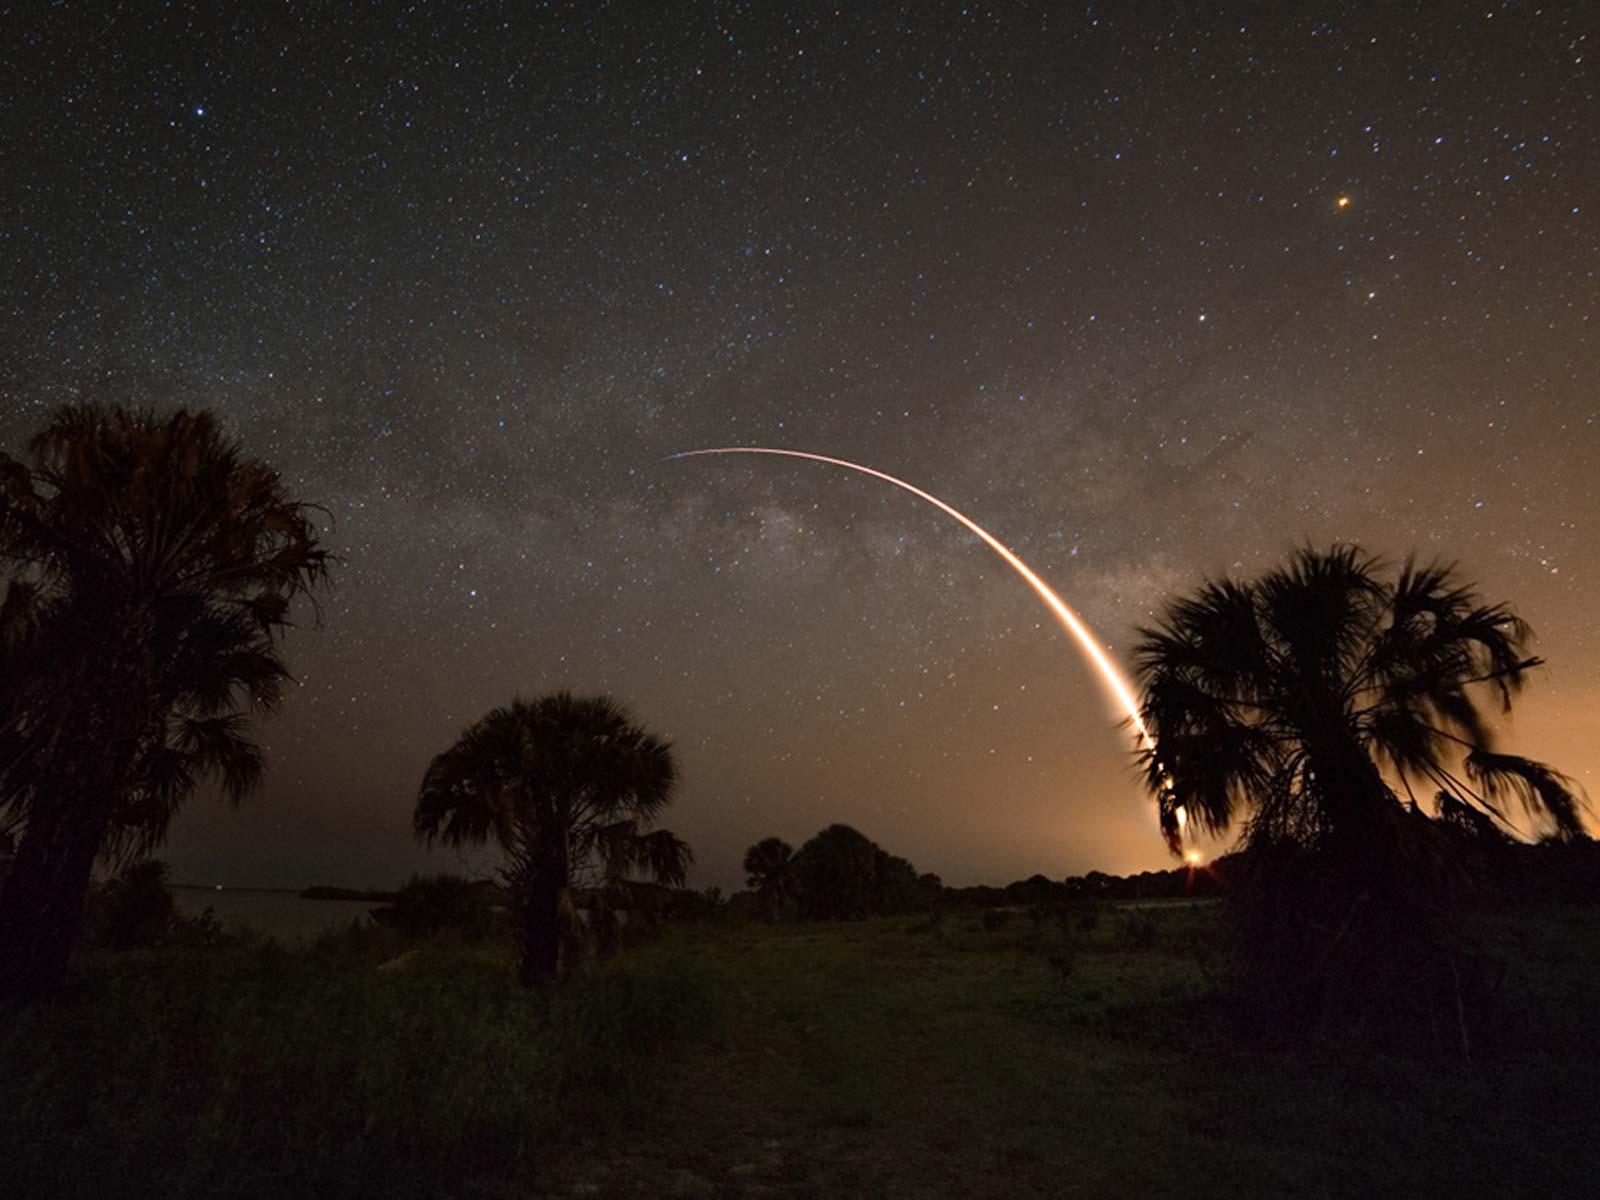 Cosmic Backdrop for Rocket Launch   Space Wallpaper